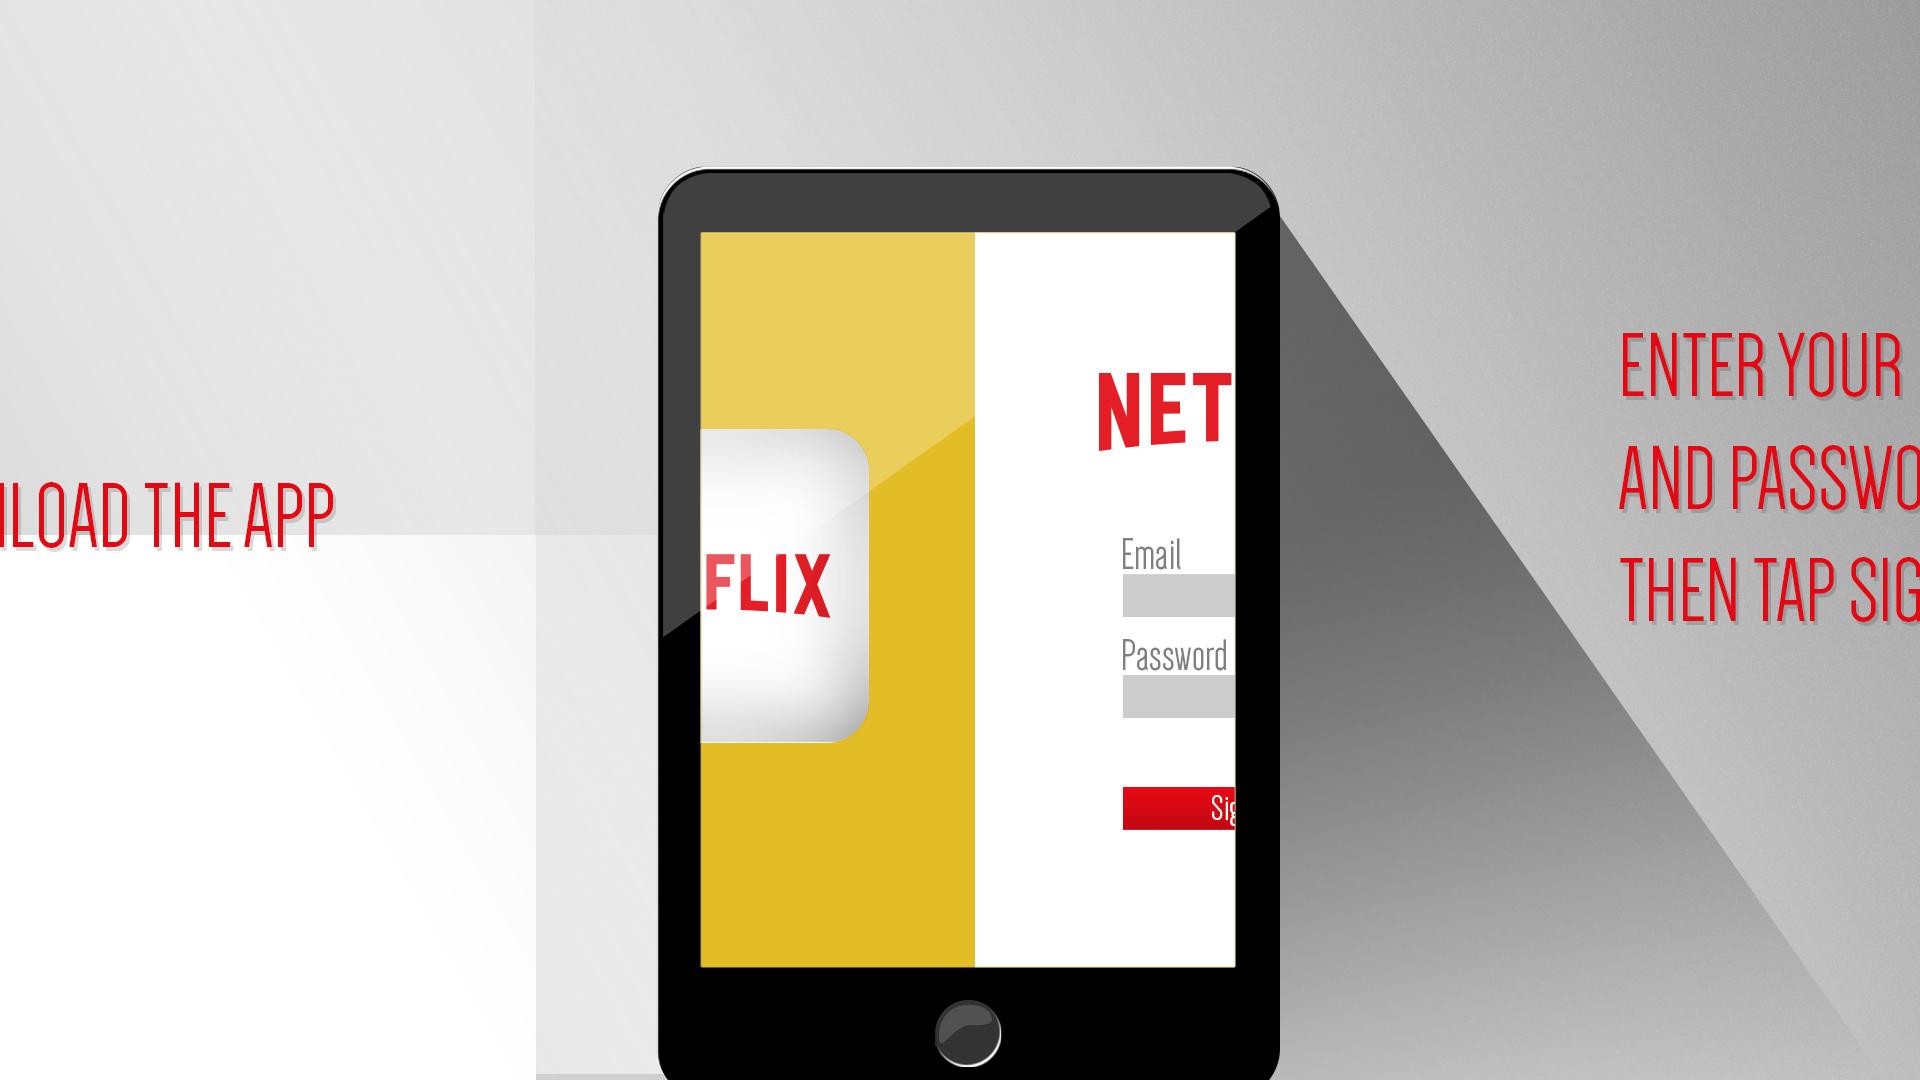 Netflix_HowTo_04b.jpg